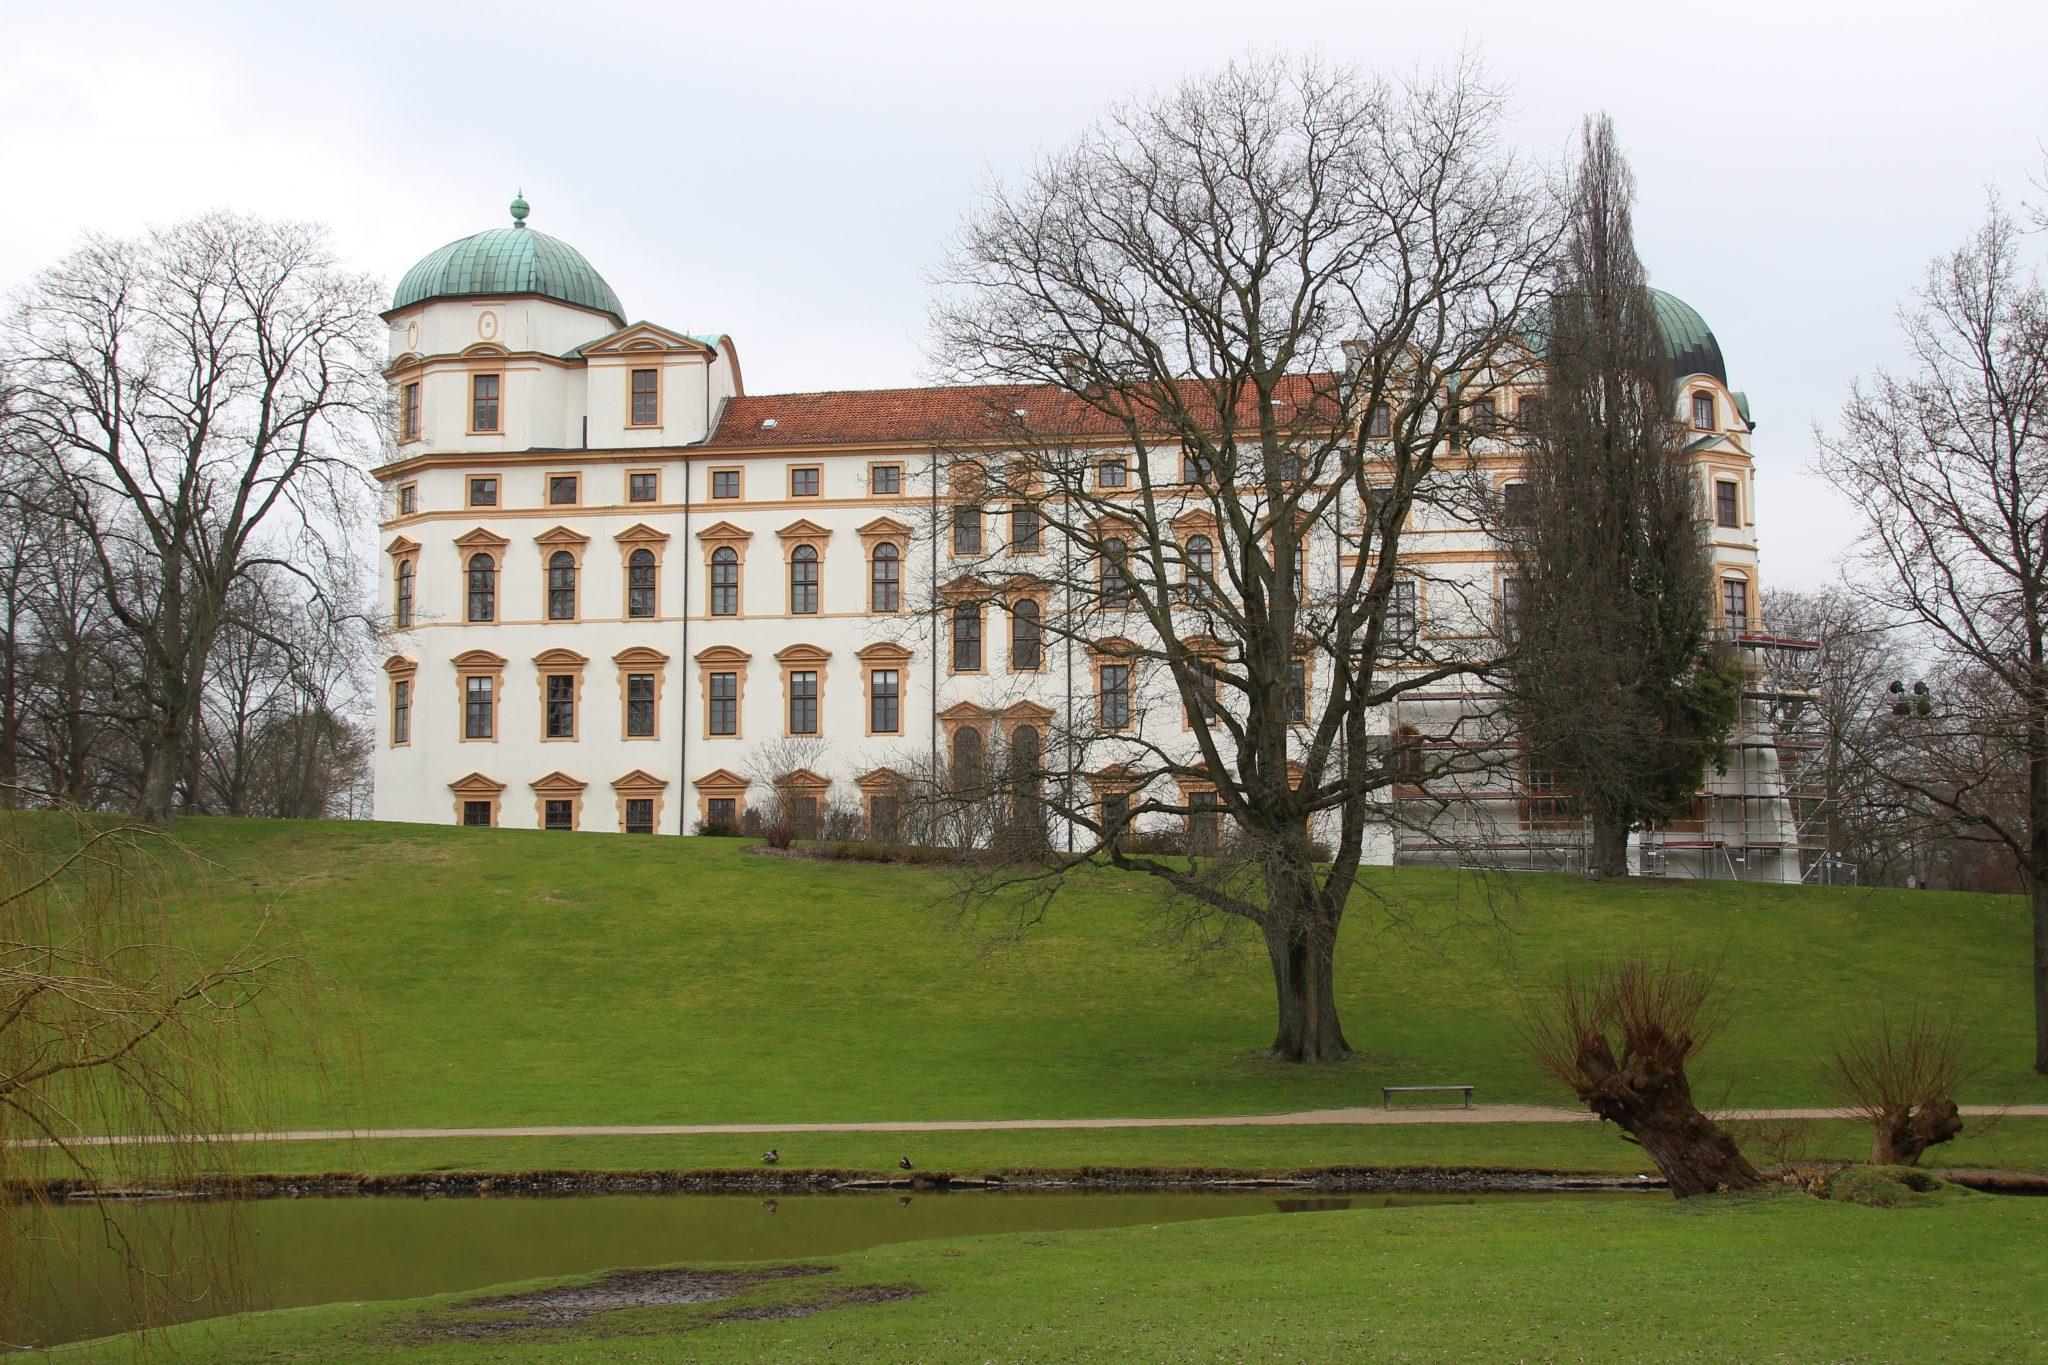 Bordell Celle